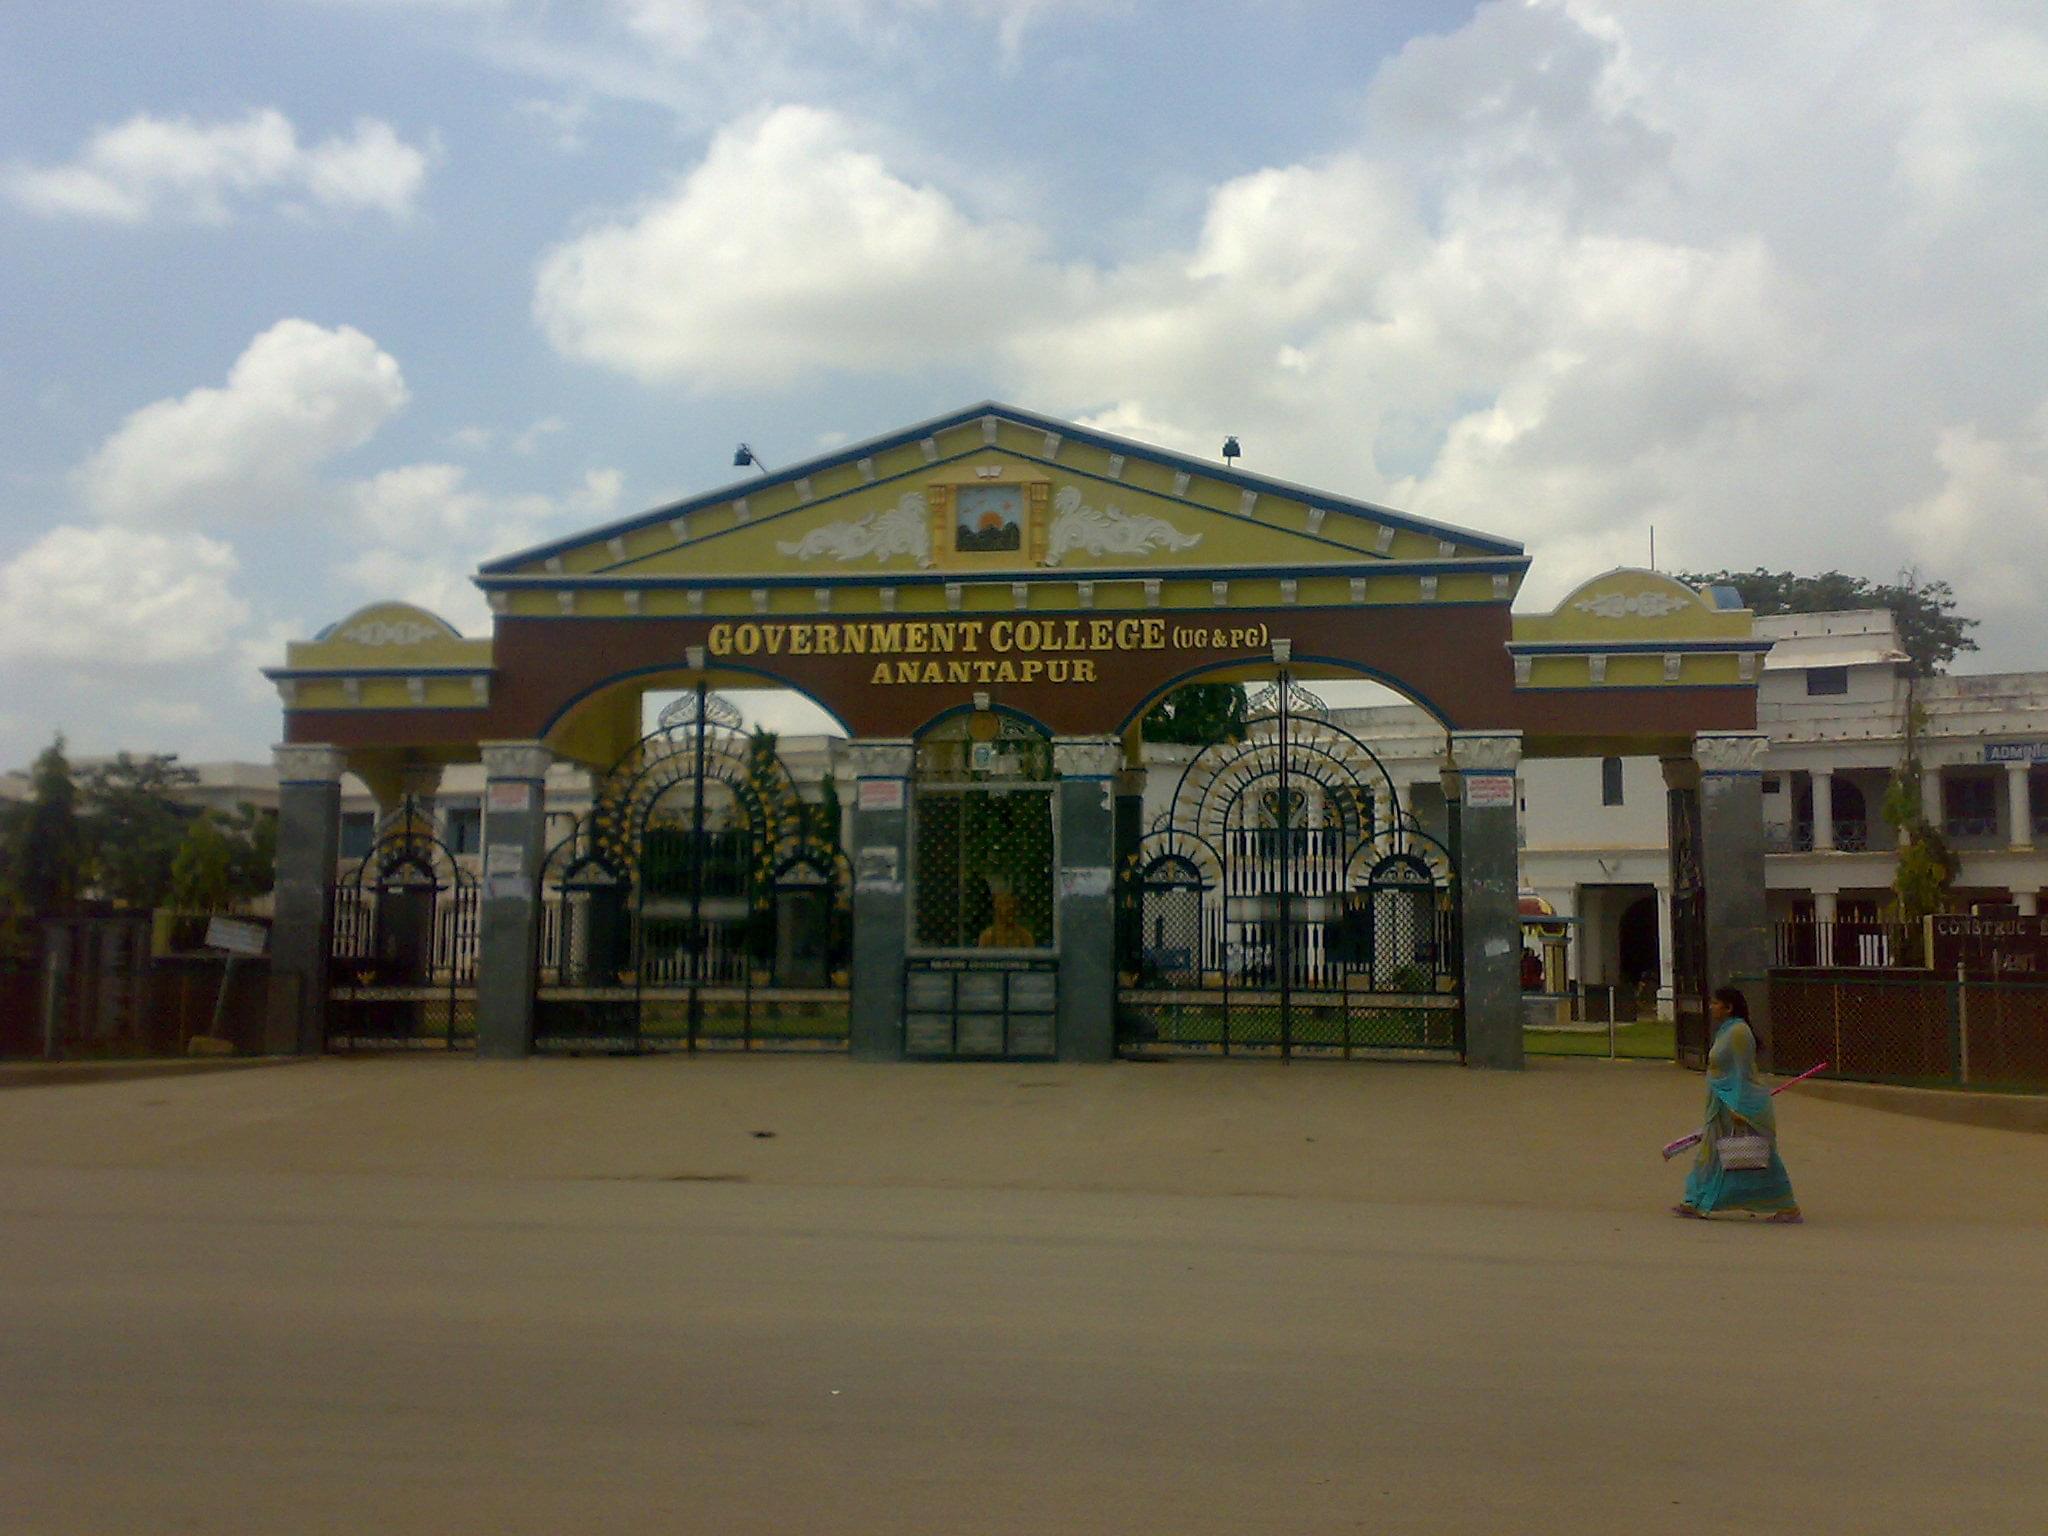 Government College (Autonomous)